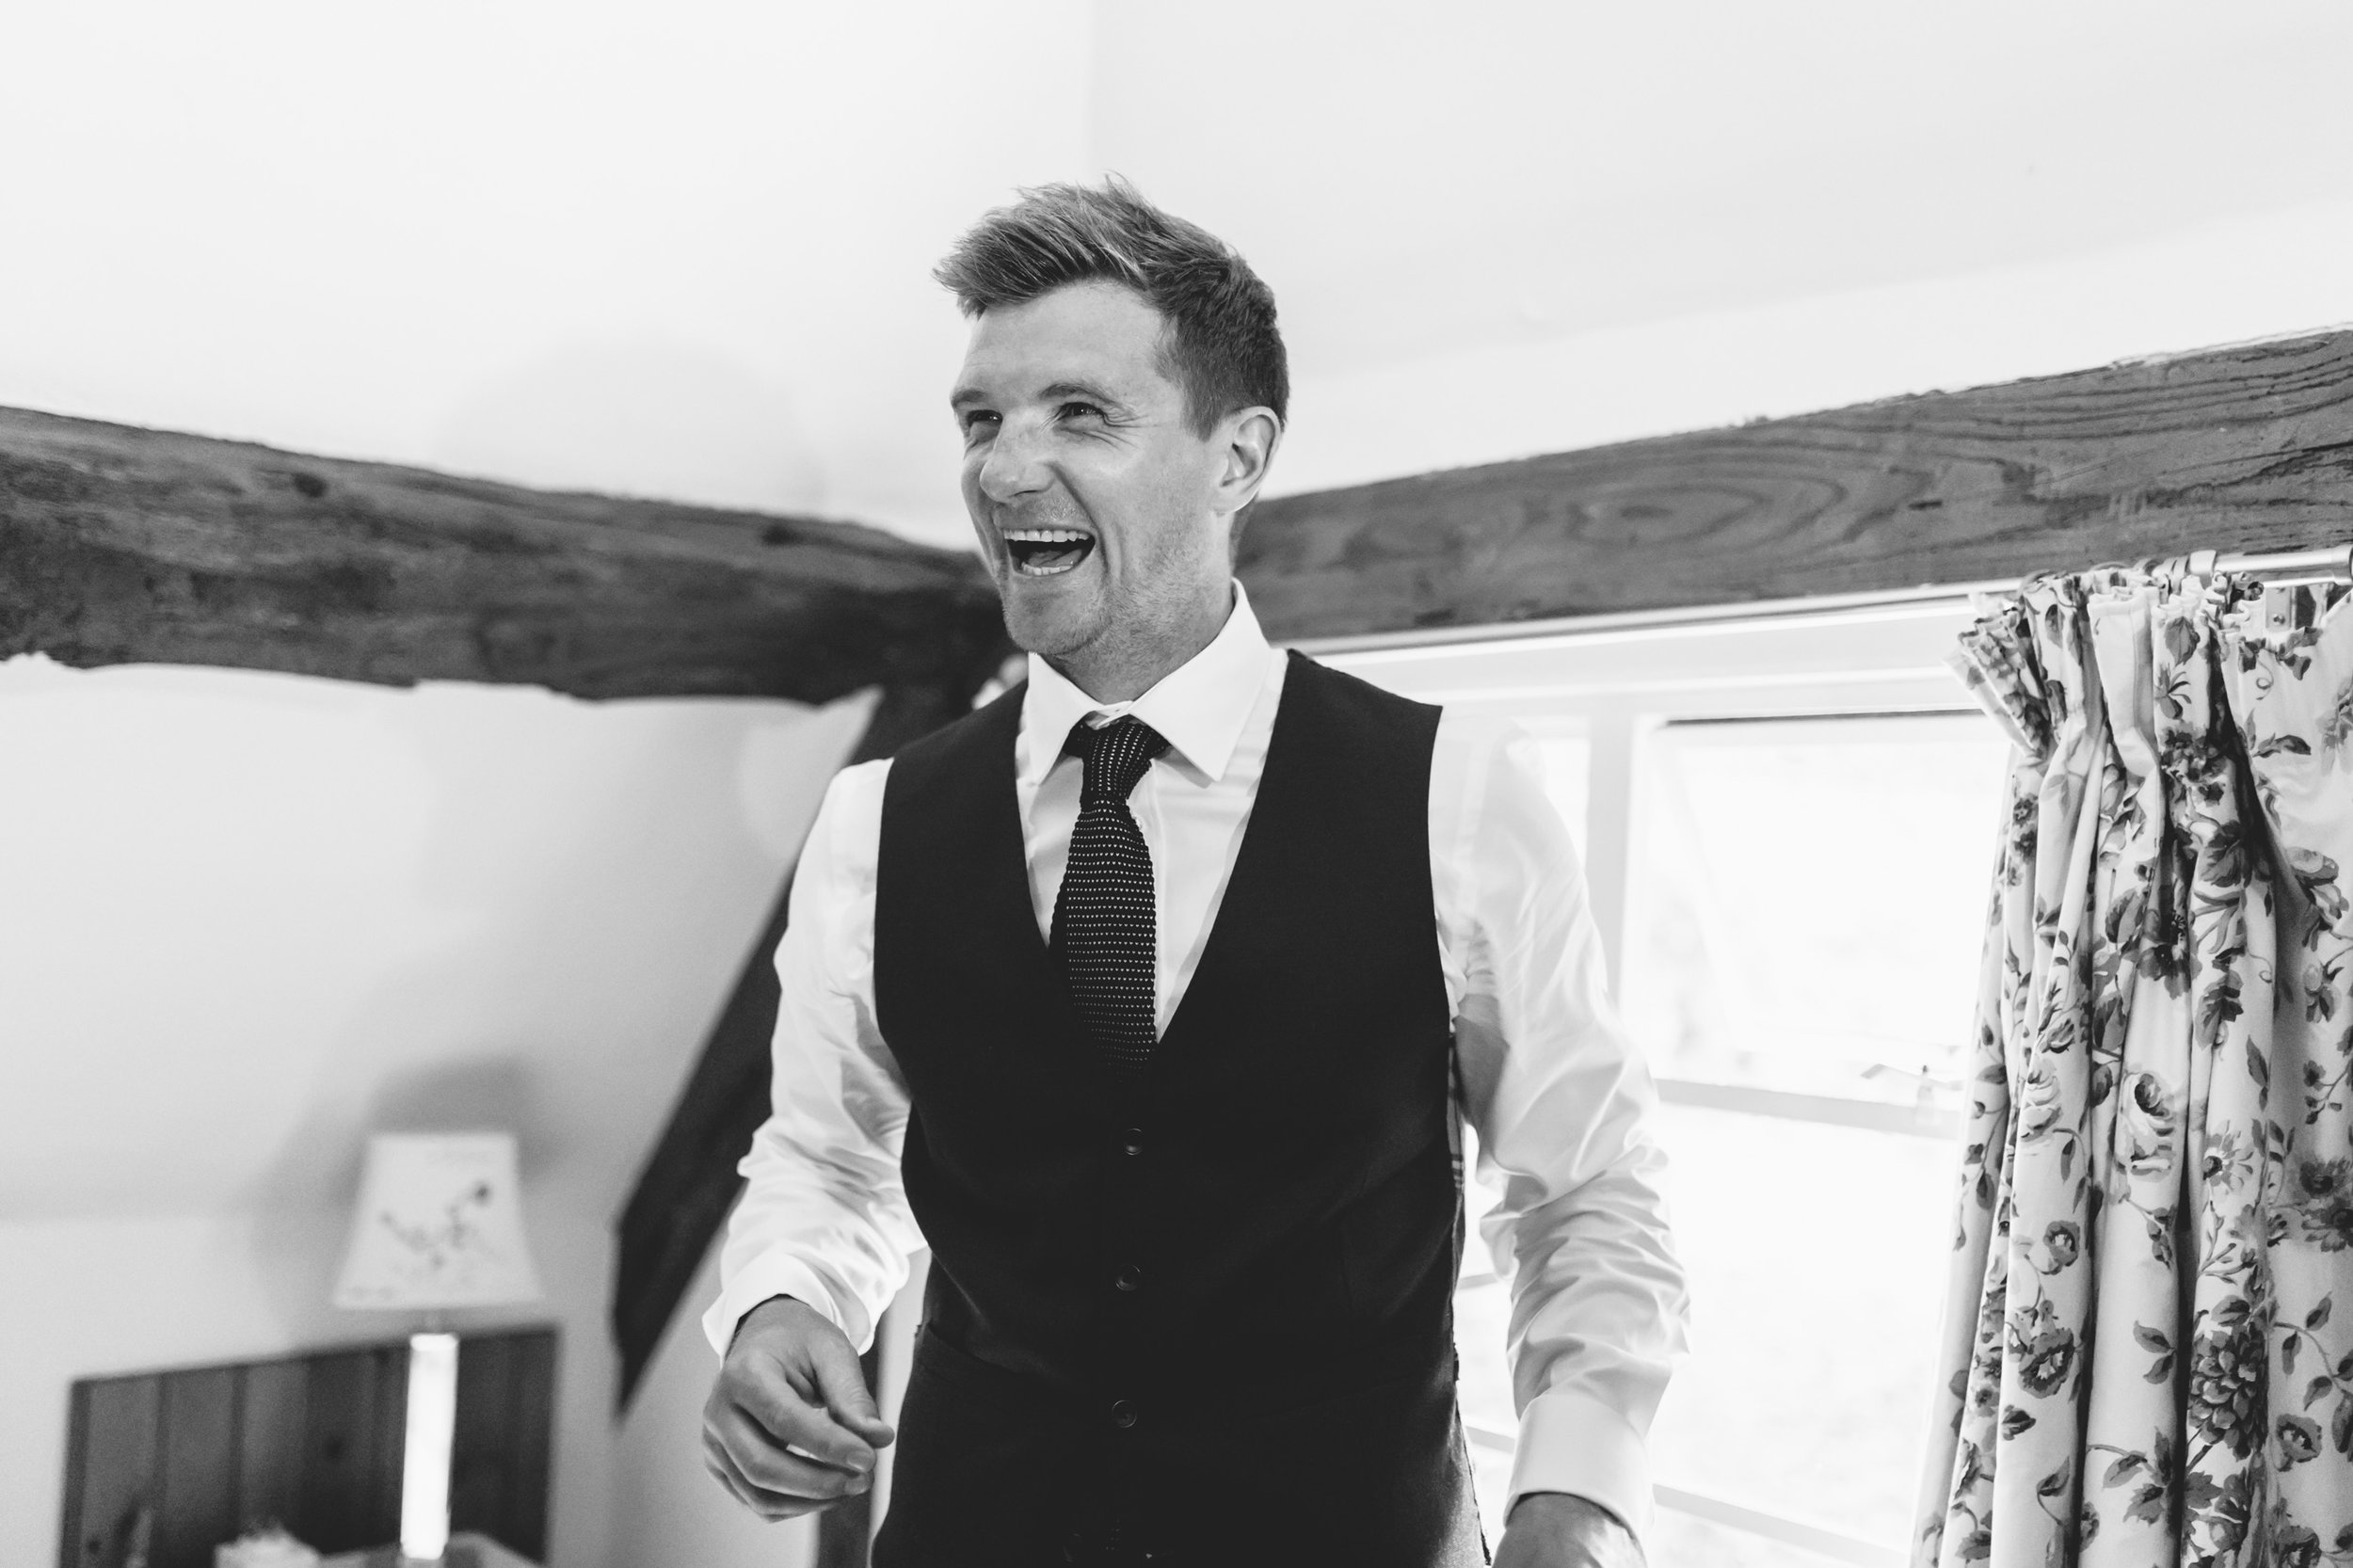 the groom Birmingham photographer wedding country artistic wedding photography92.jpg